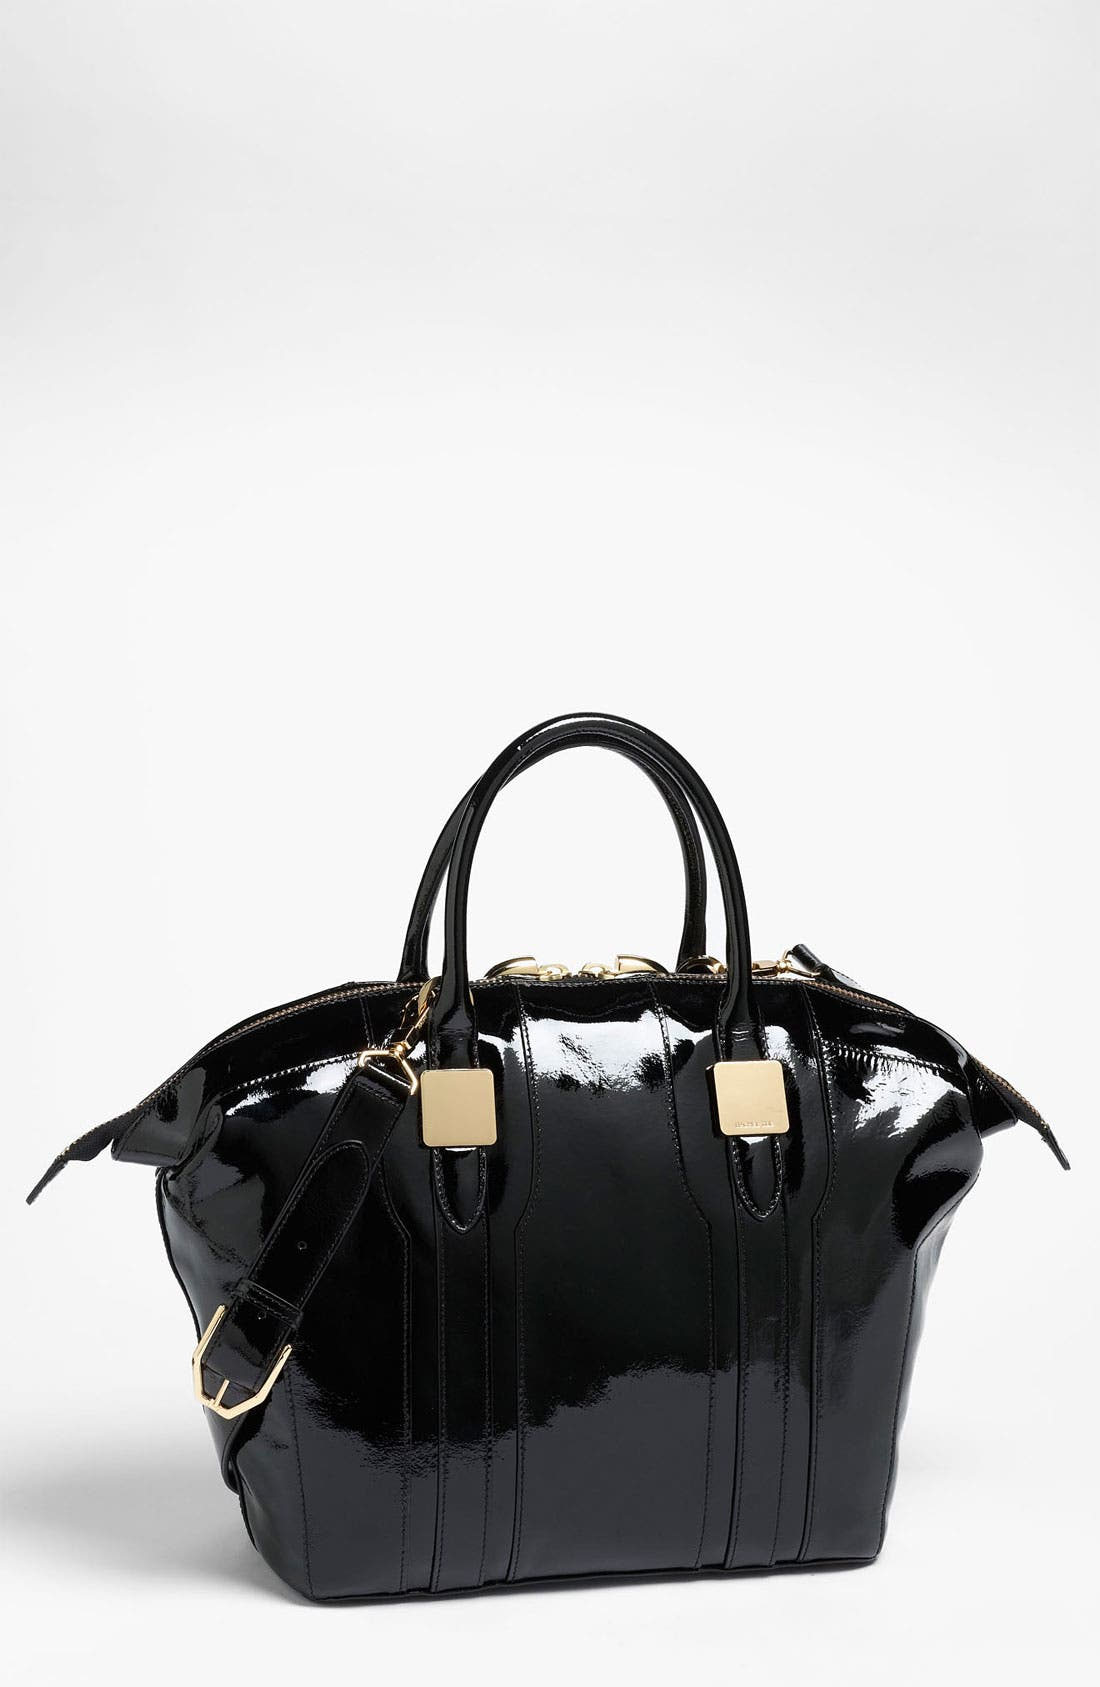 Main Image - Rachel Zoe 'Morrison - Medium' Patent Leather Tote